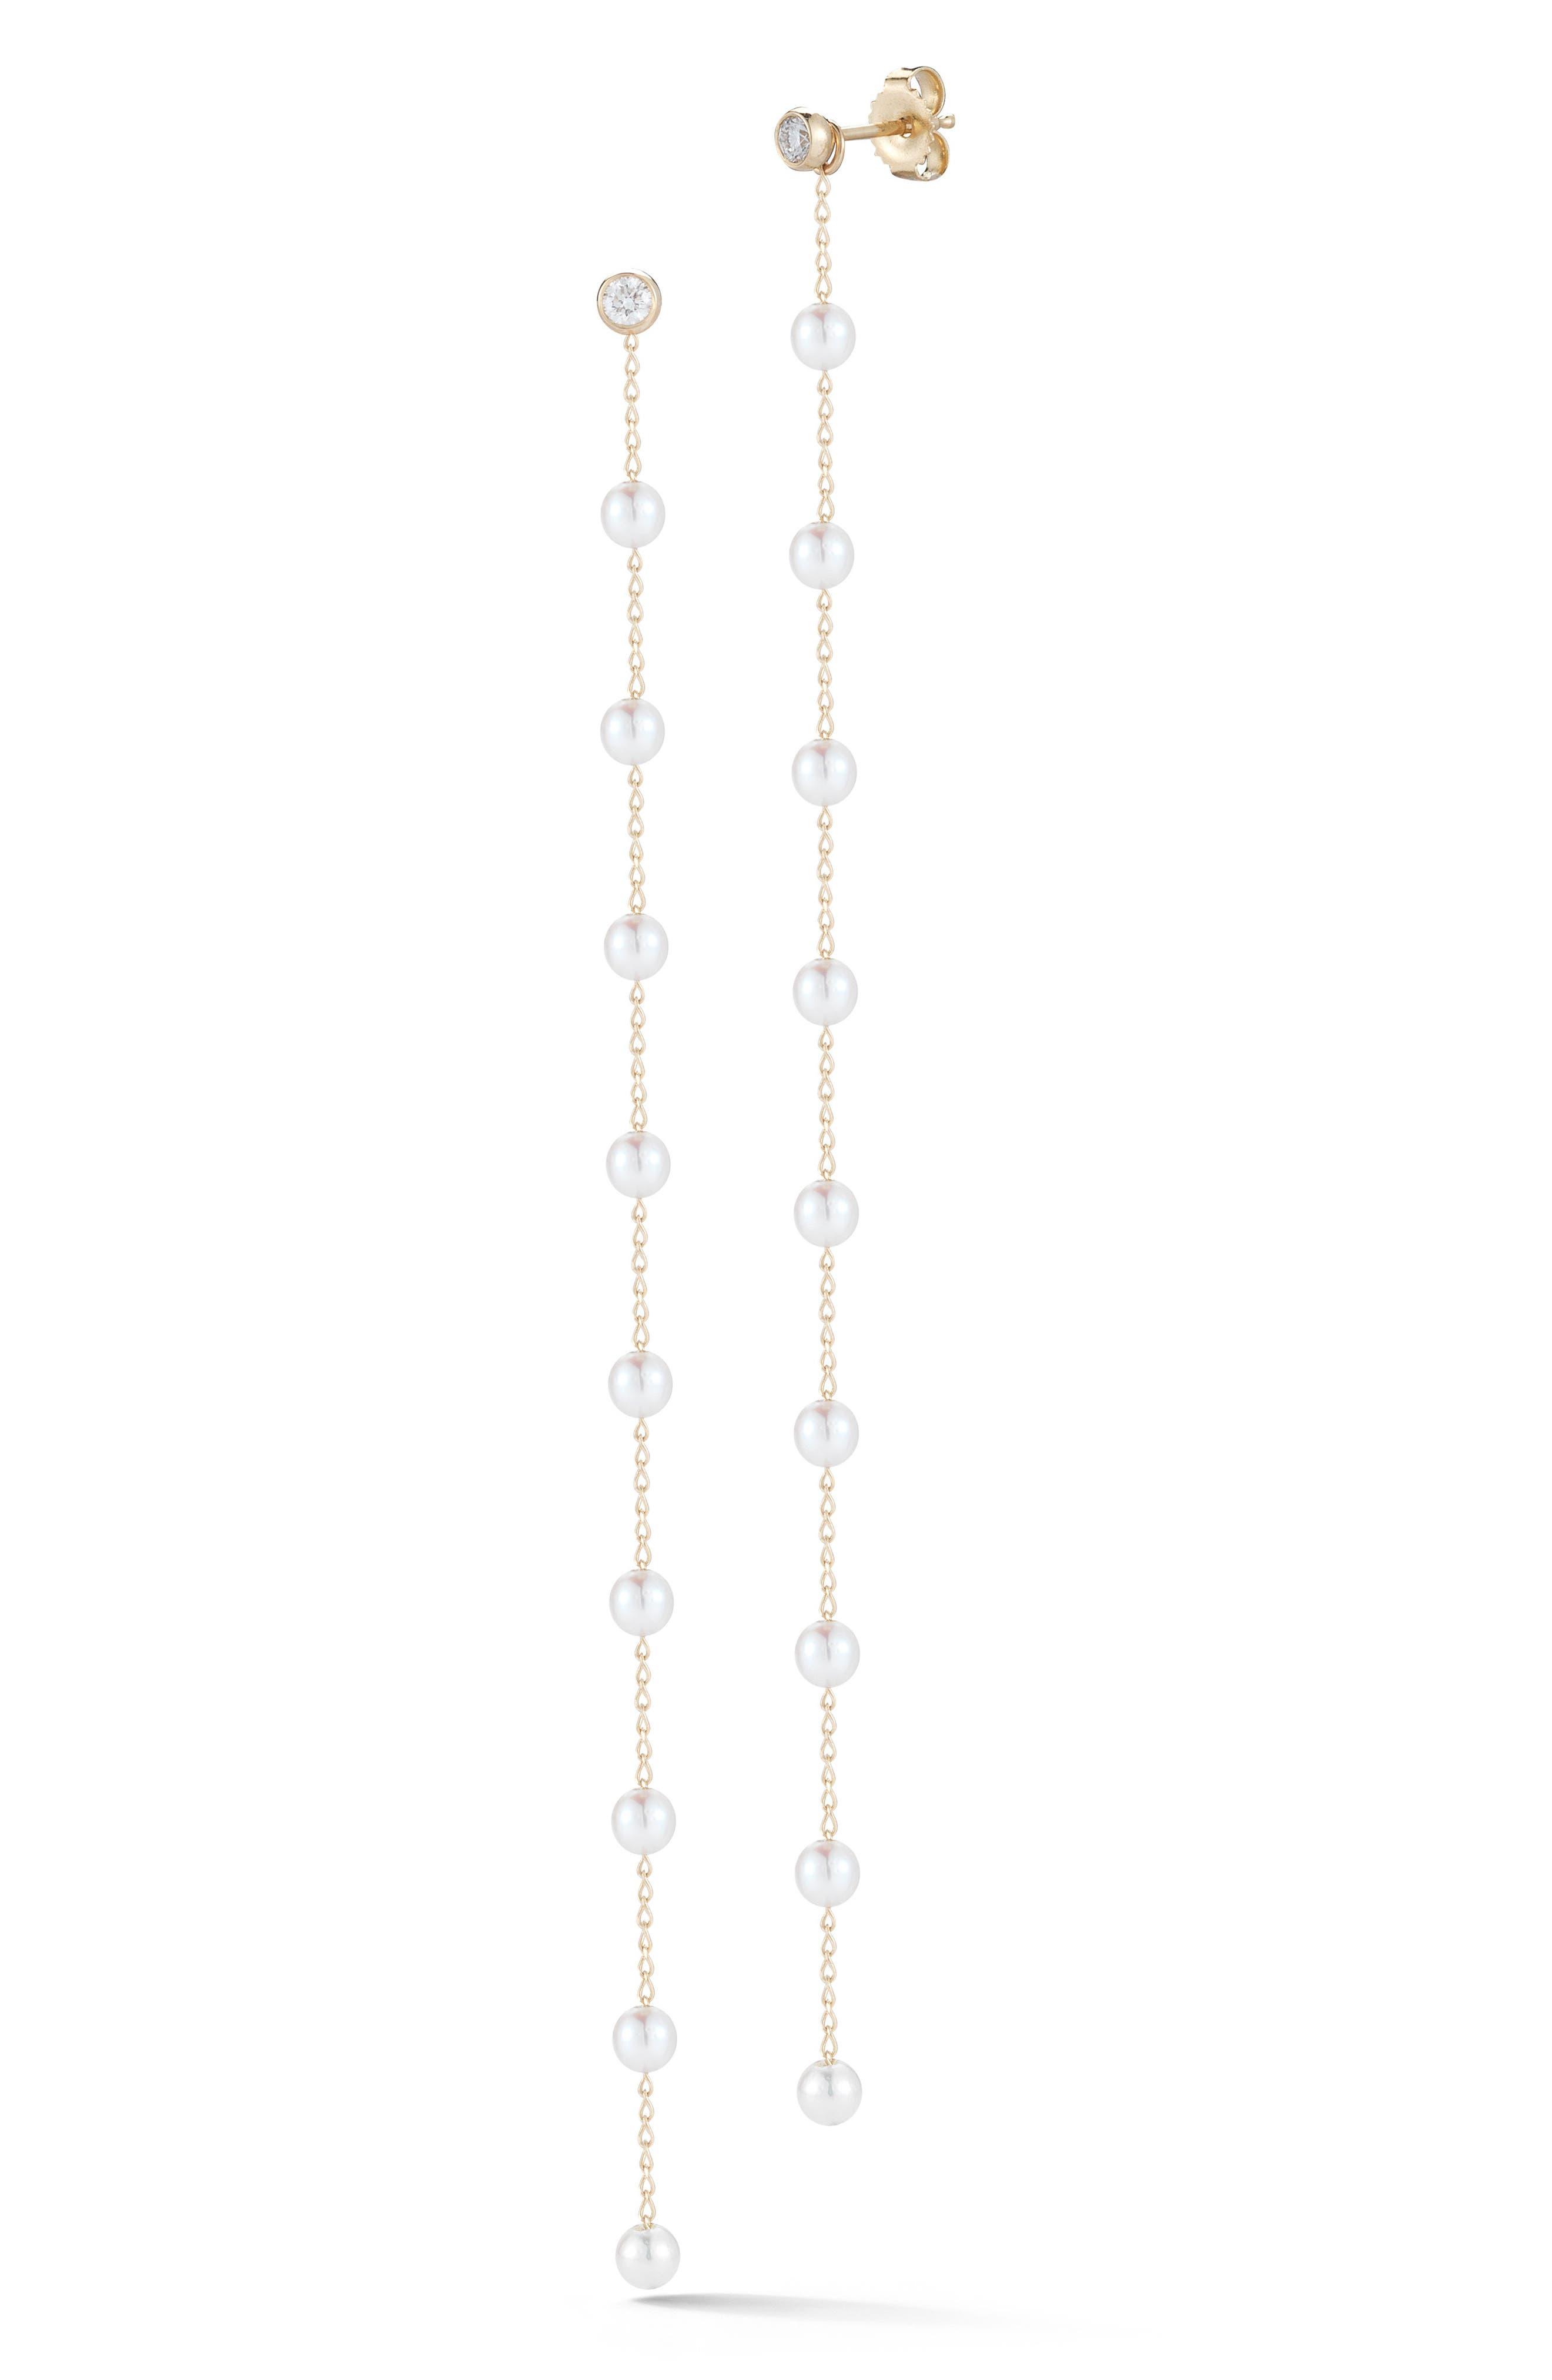 Long Pearl & Diamond Drop Earrings,                             Main thumbnail 1, color,                             YELLOW GOLD/ WHITE PEARL